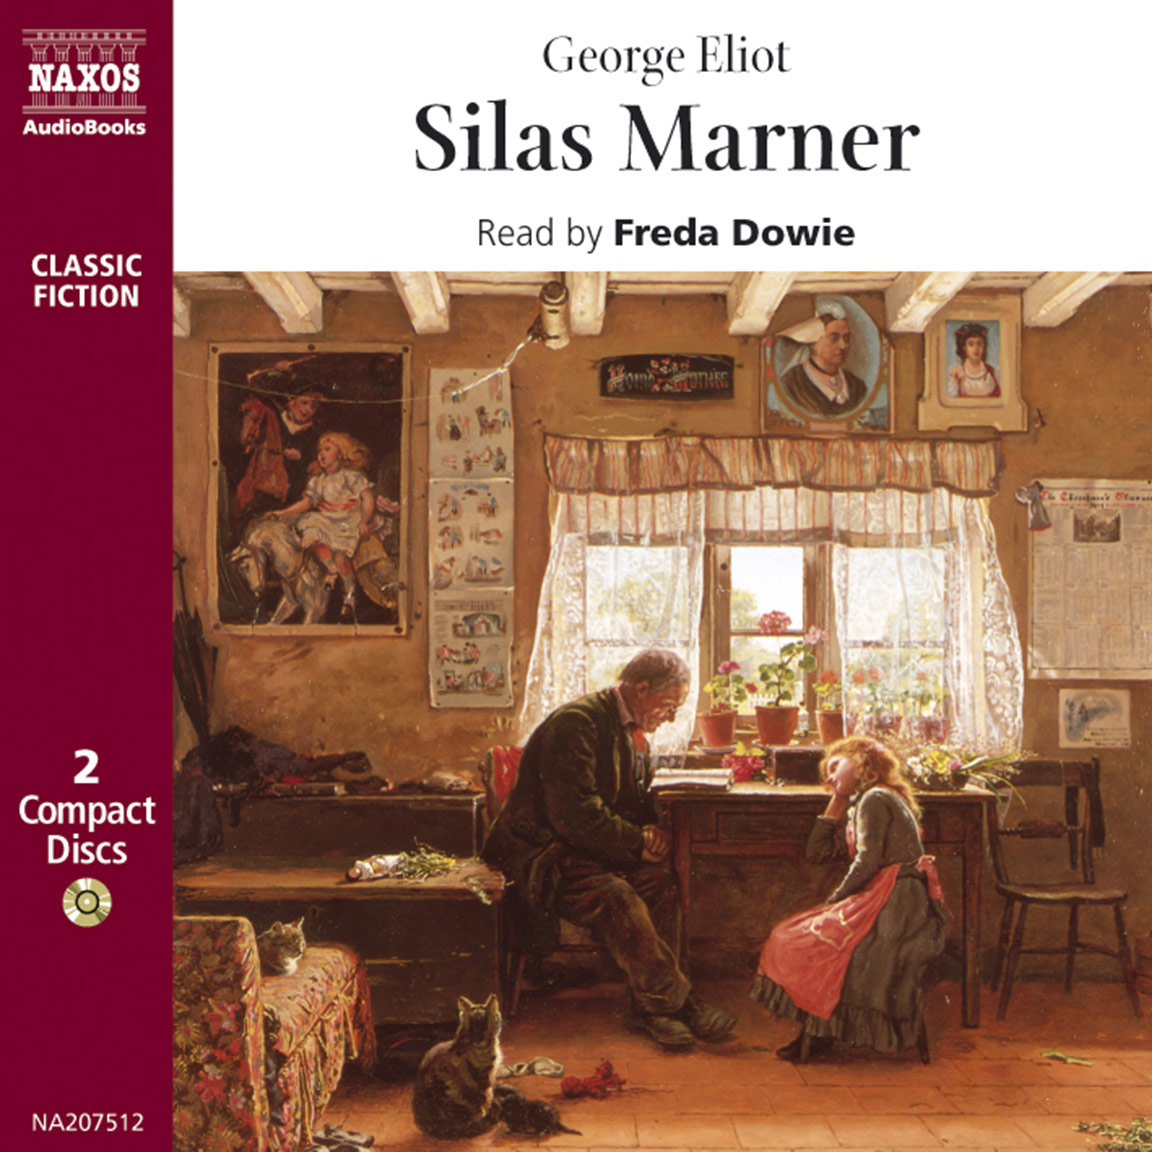 Silas Marner (abridged)